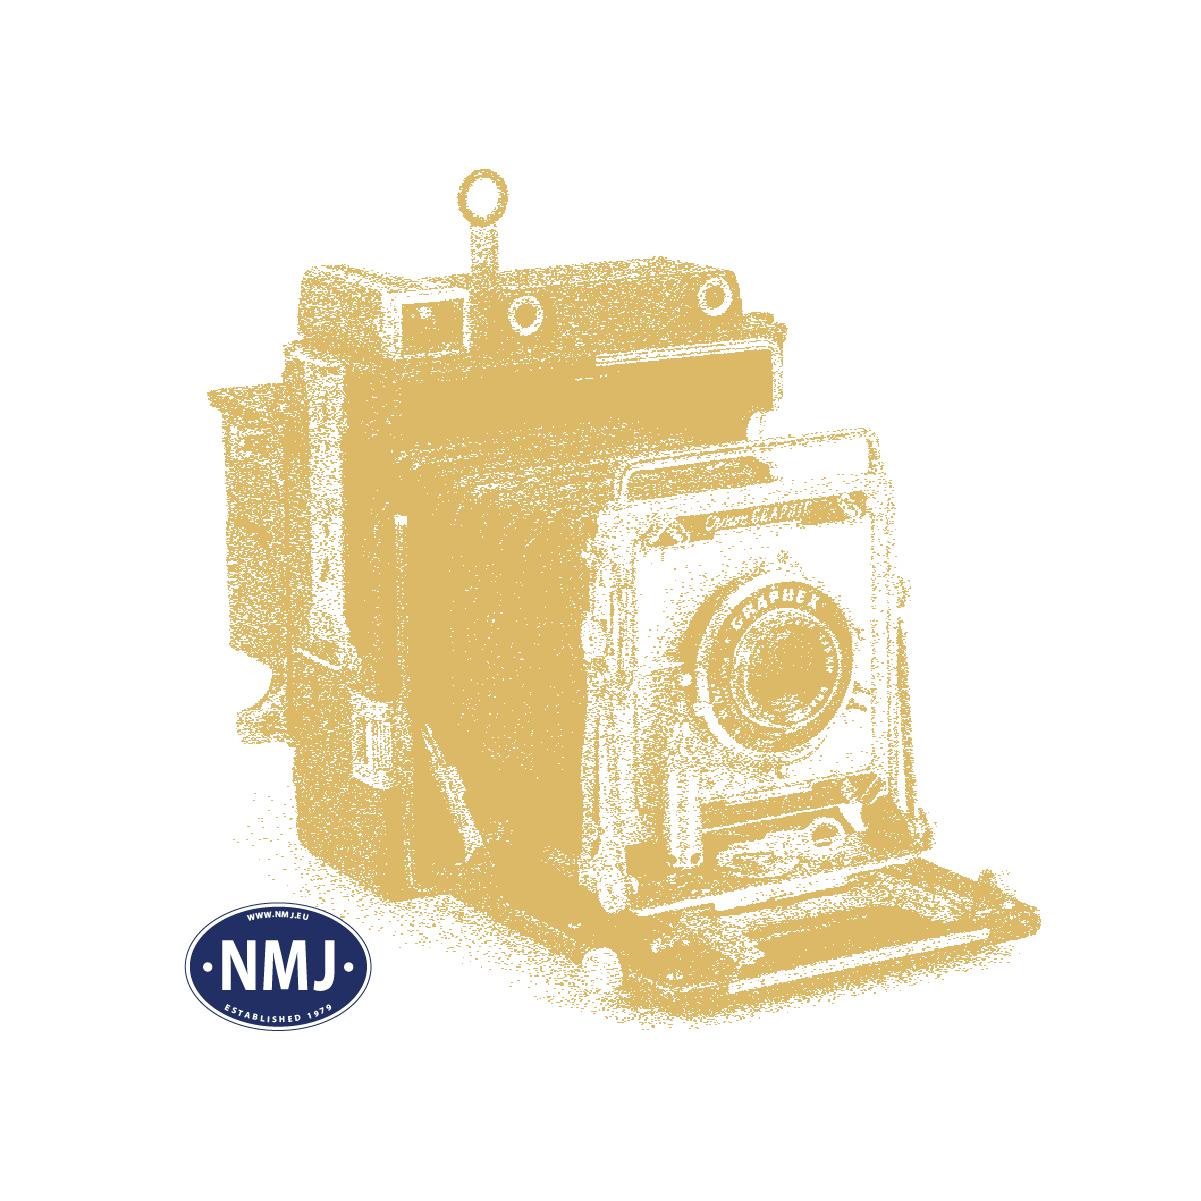 NOC15558 - Stamgjester